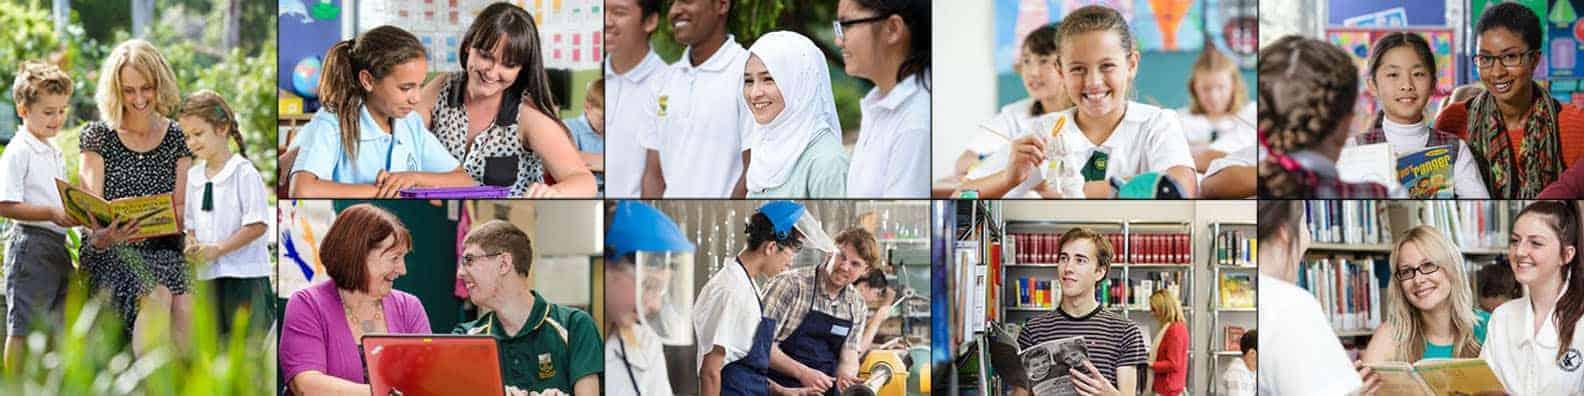 Improve Your School Promo Photos